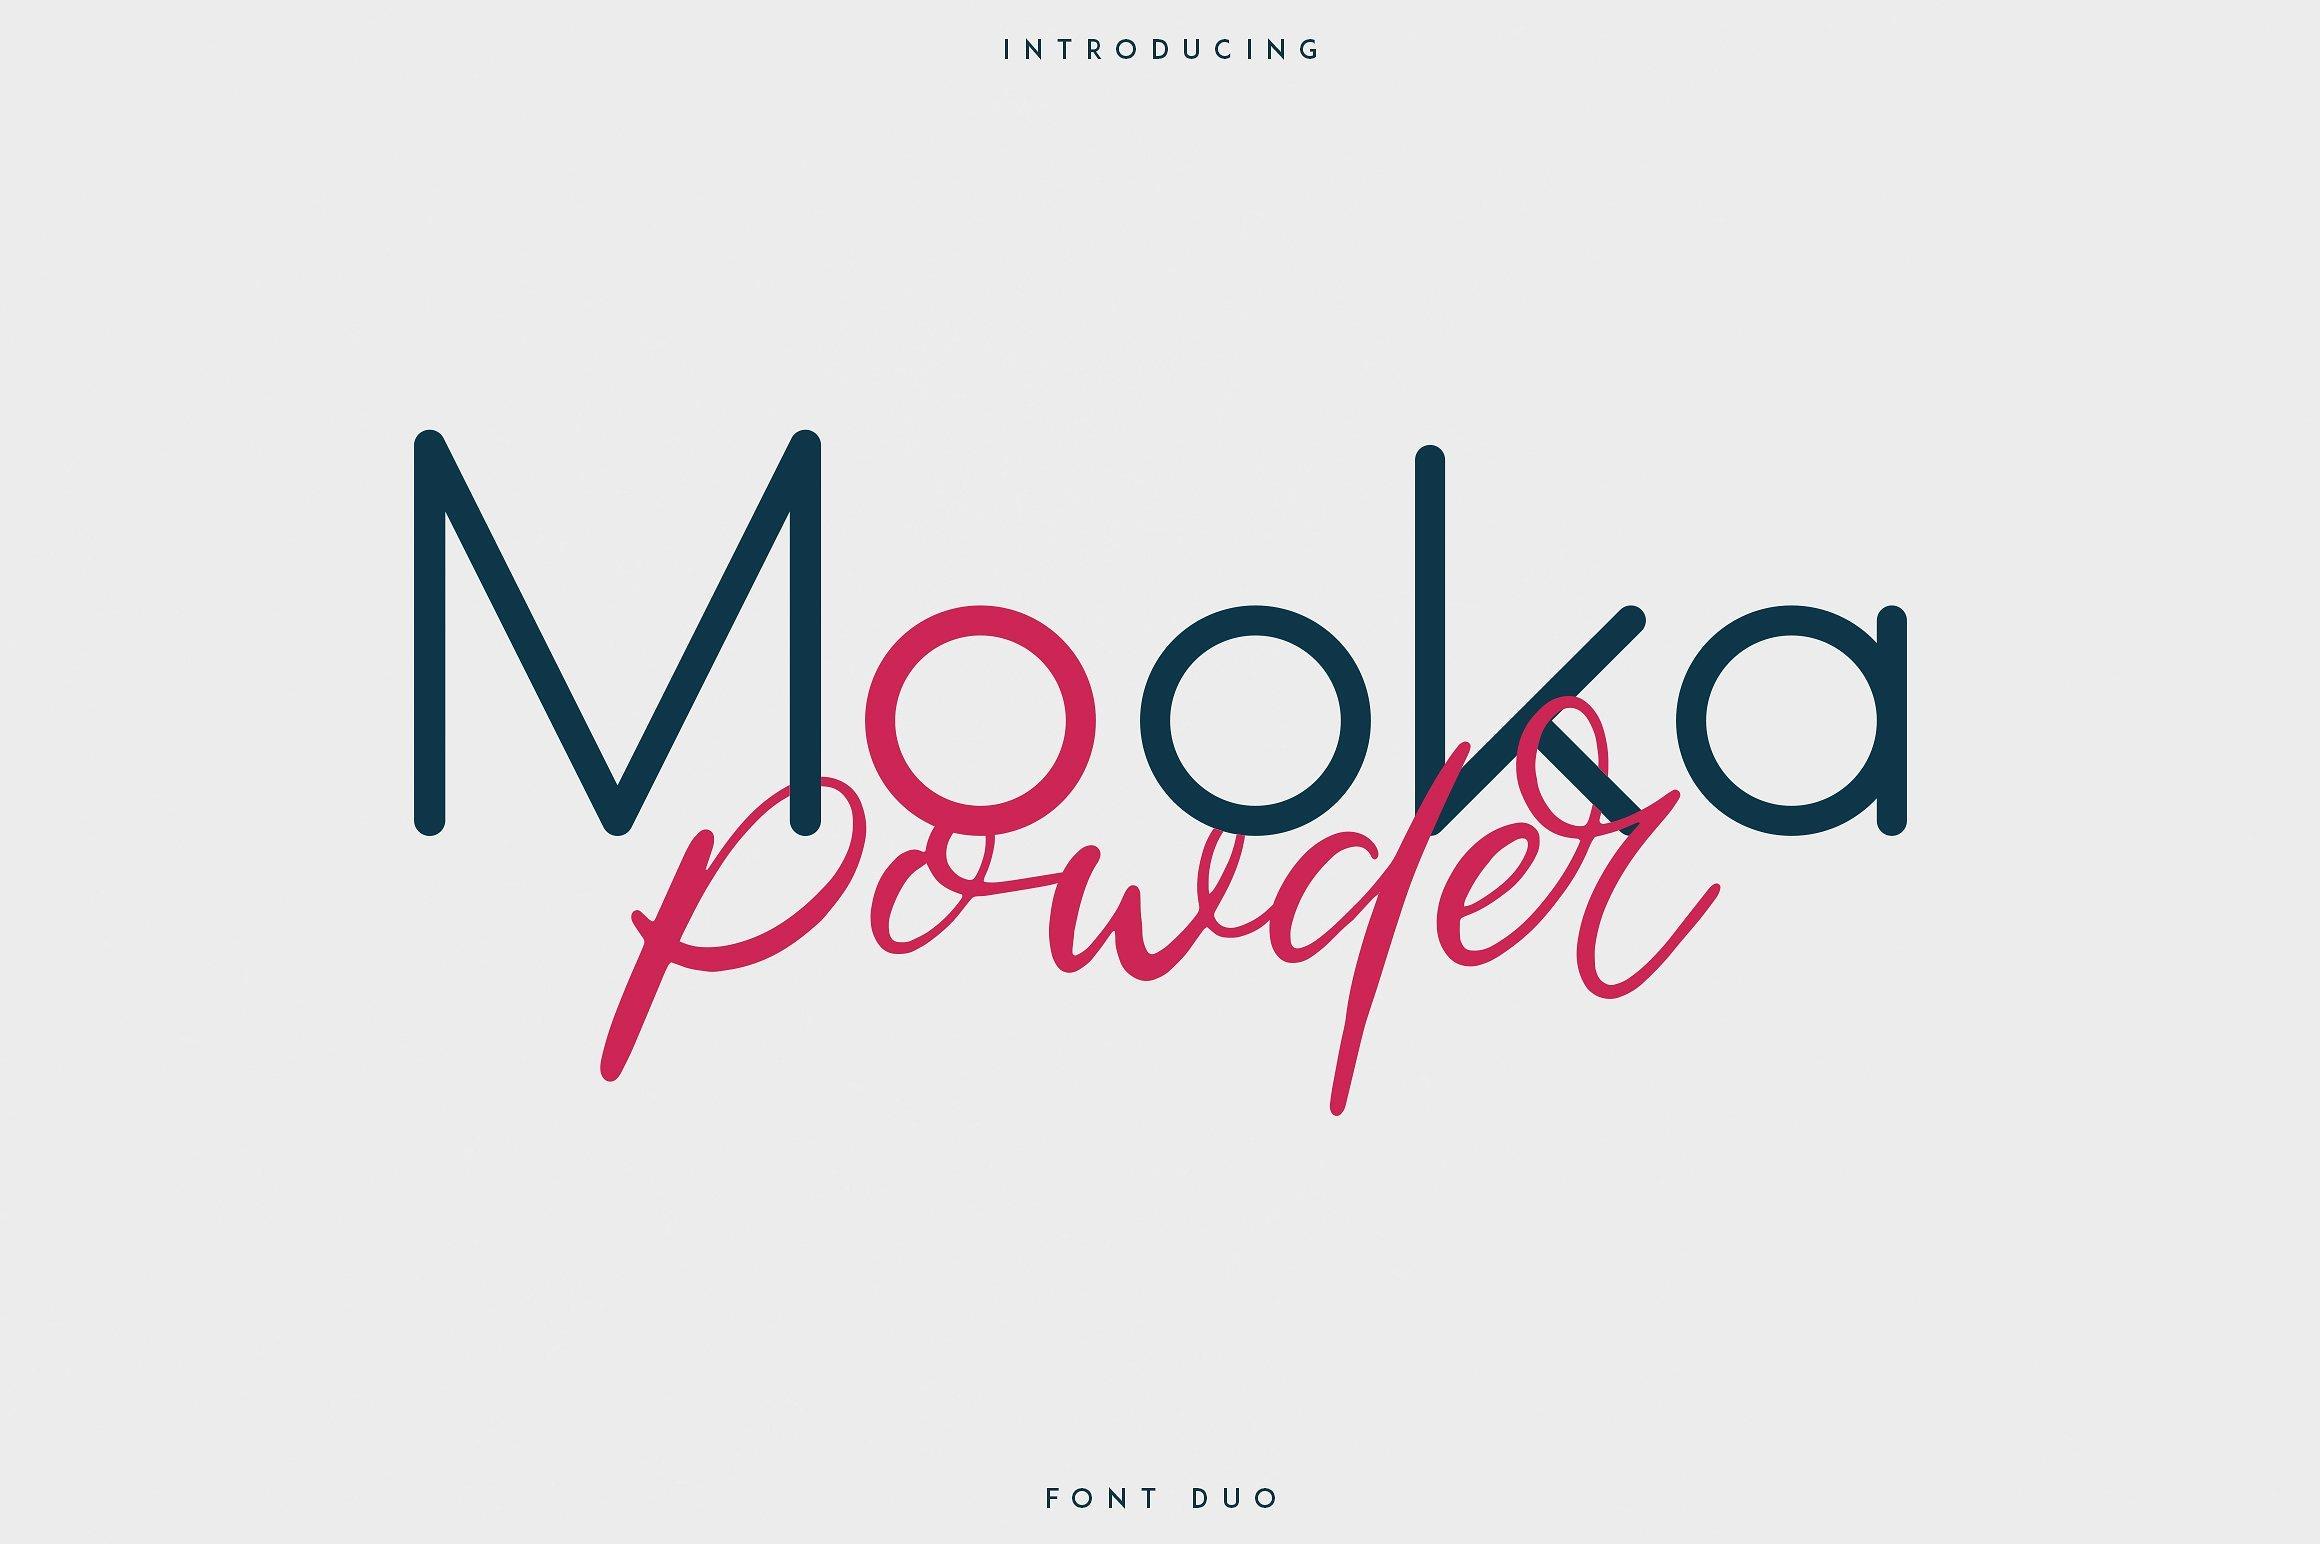 https://fontclarity.com/wp-content/uploads/2019/09/mooka-powder-font-duo-download-0.jpg Free Download